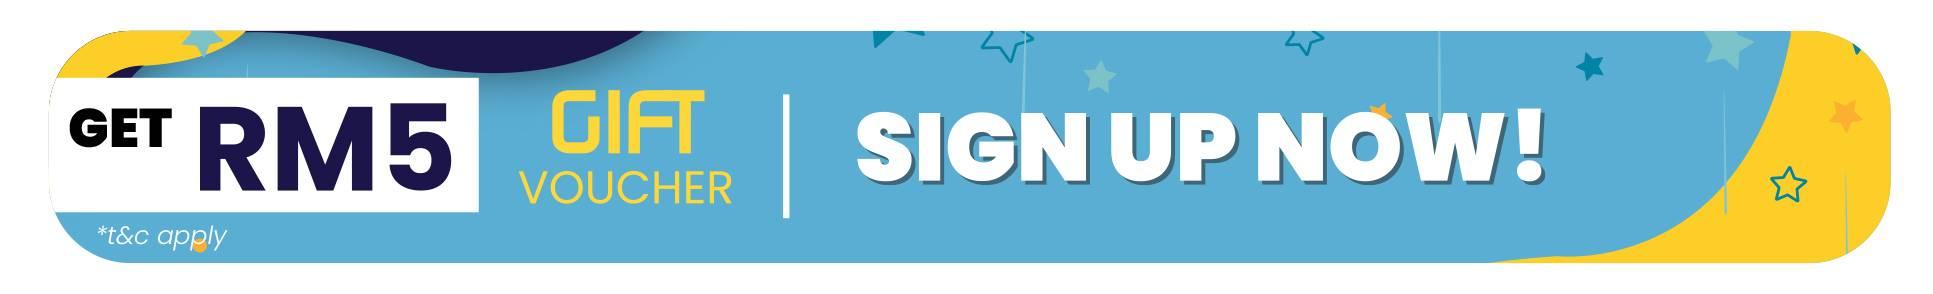 Sign up now & Get RM5 Discount Voucher